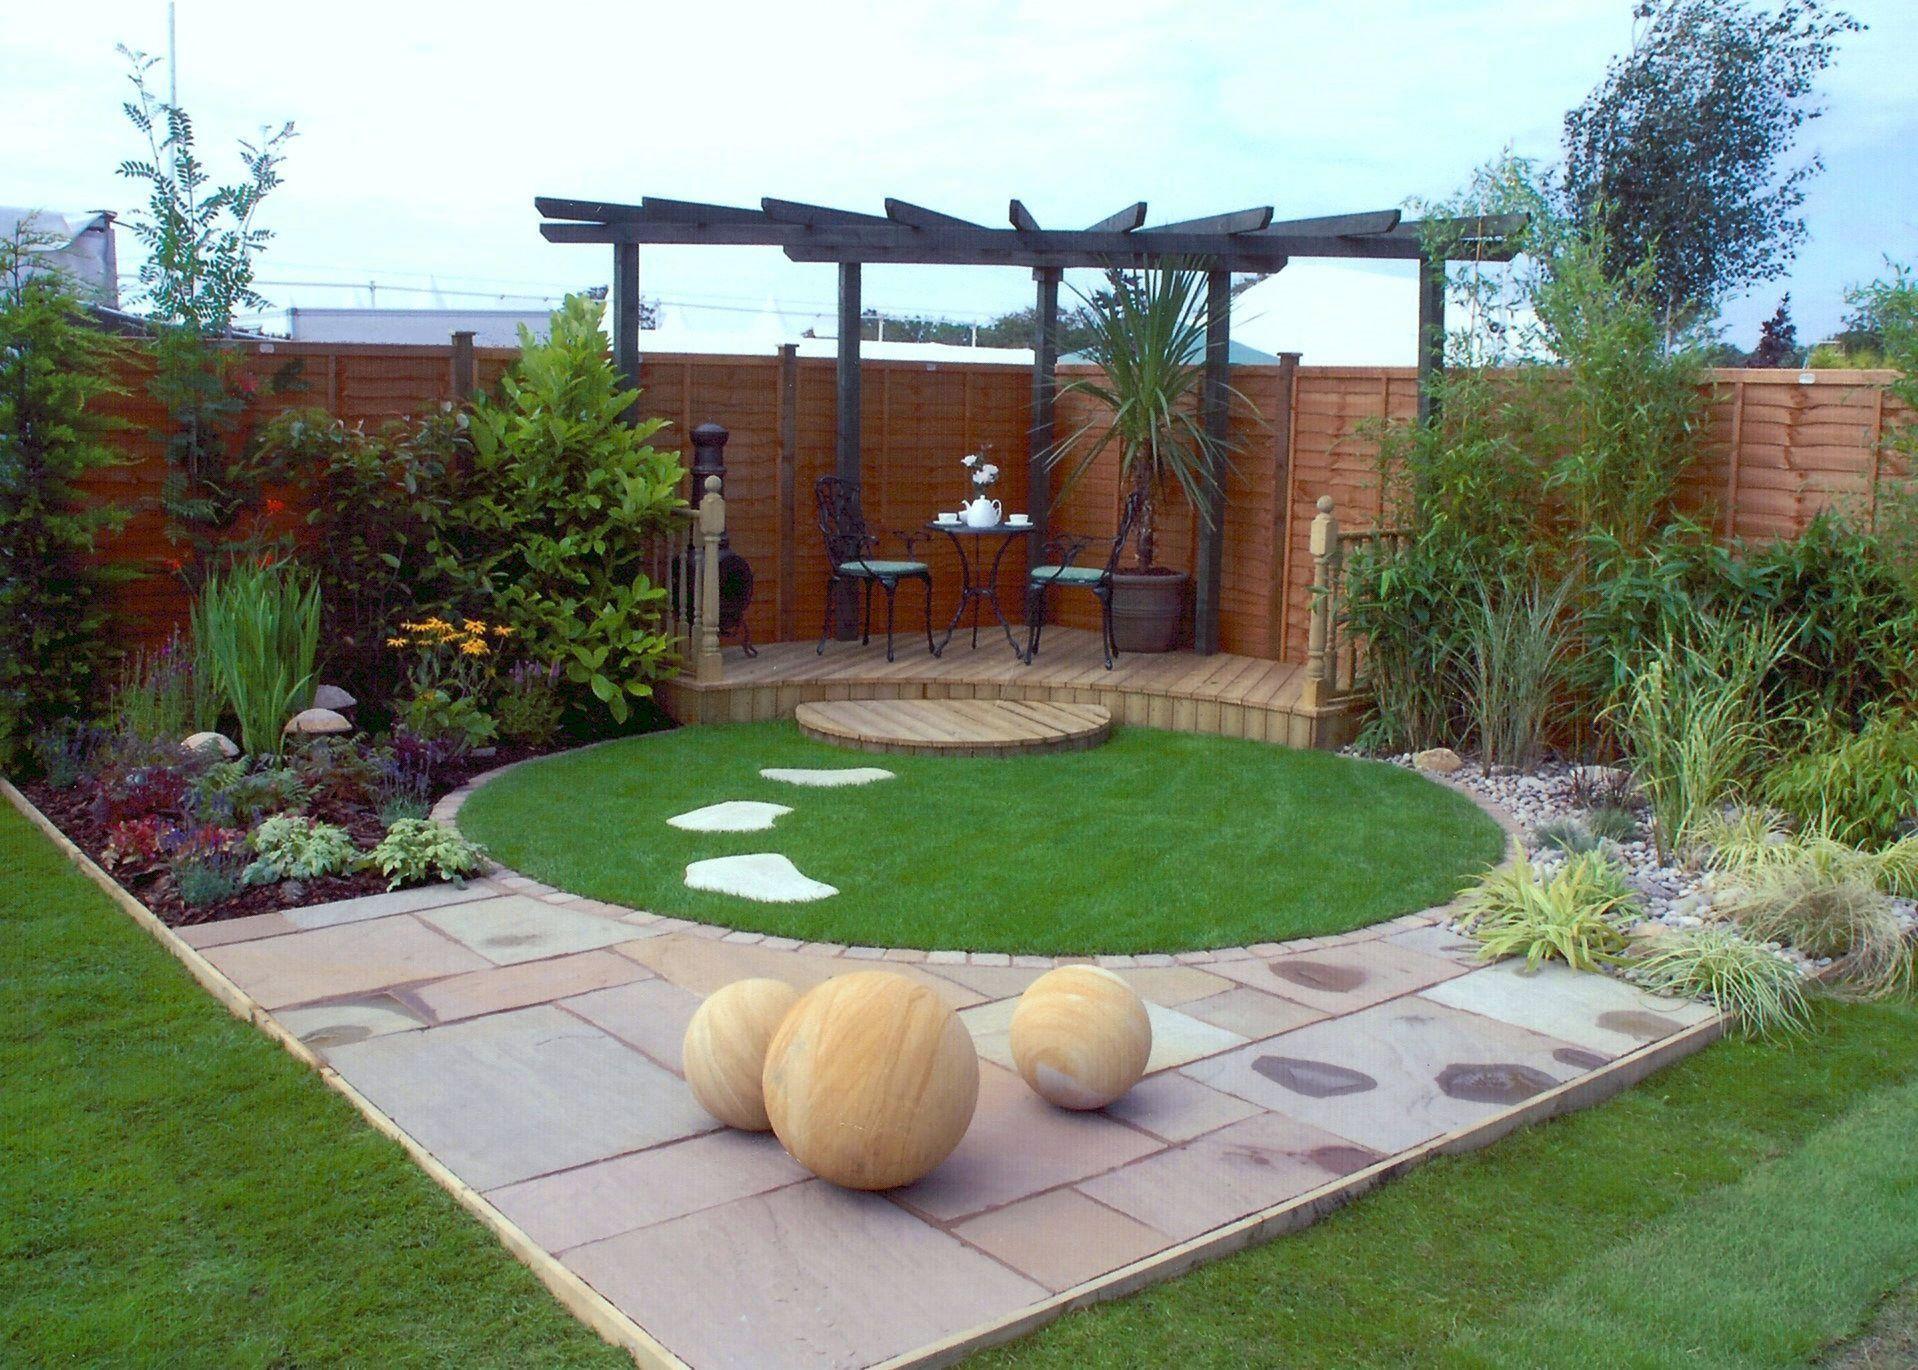 2b48ccdaa34709c16f444744fa26a879 - Simple Garden Design Ideas For Small Gardens